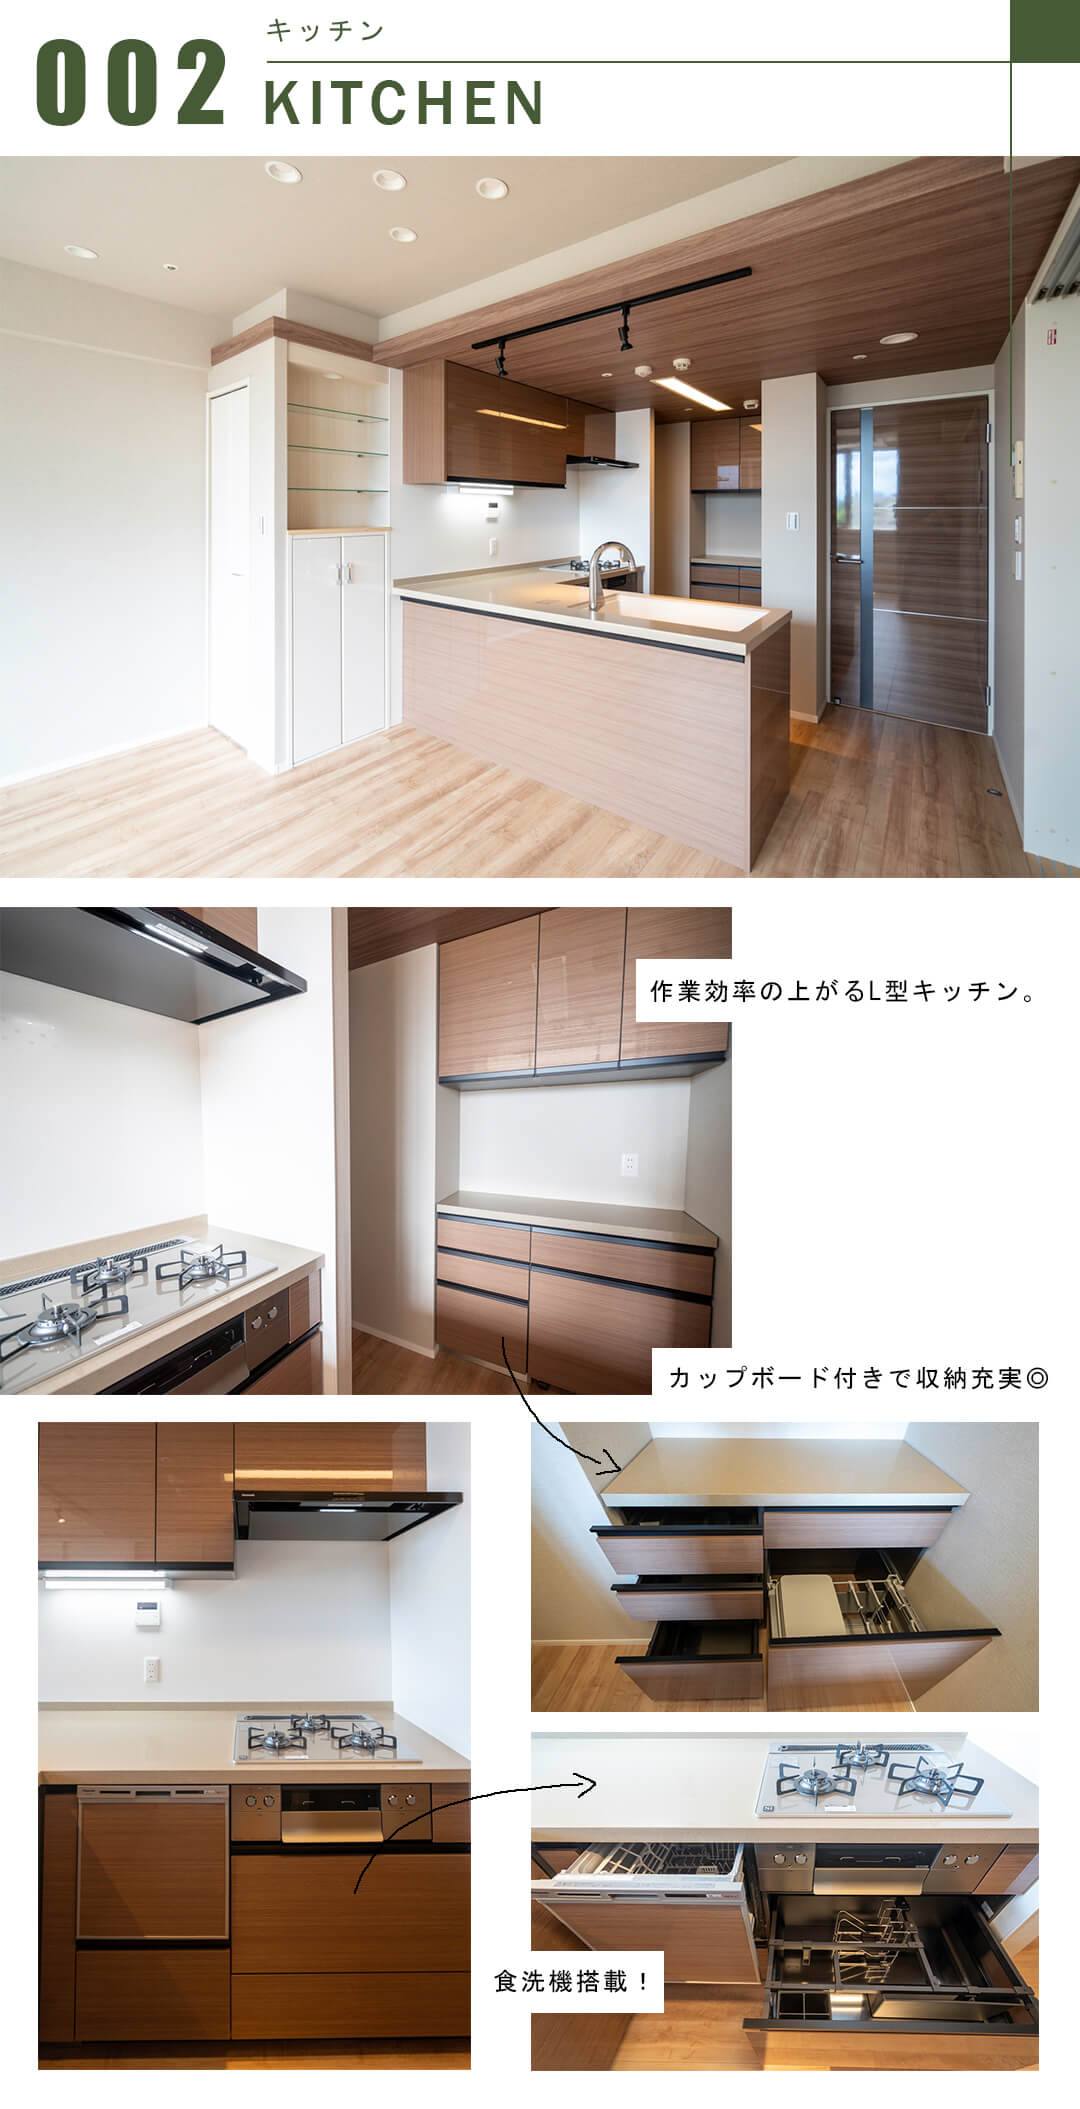 Brillia護国寺富士見坂のキッチン